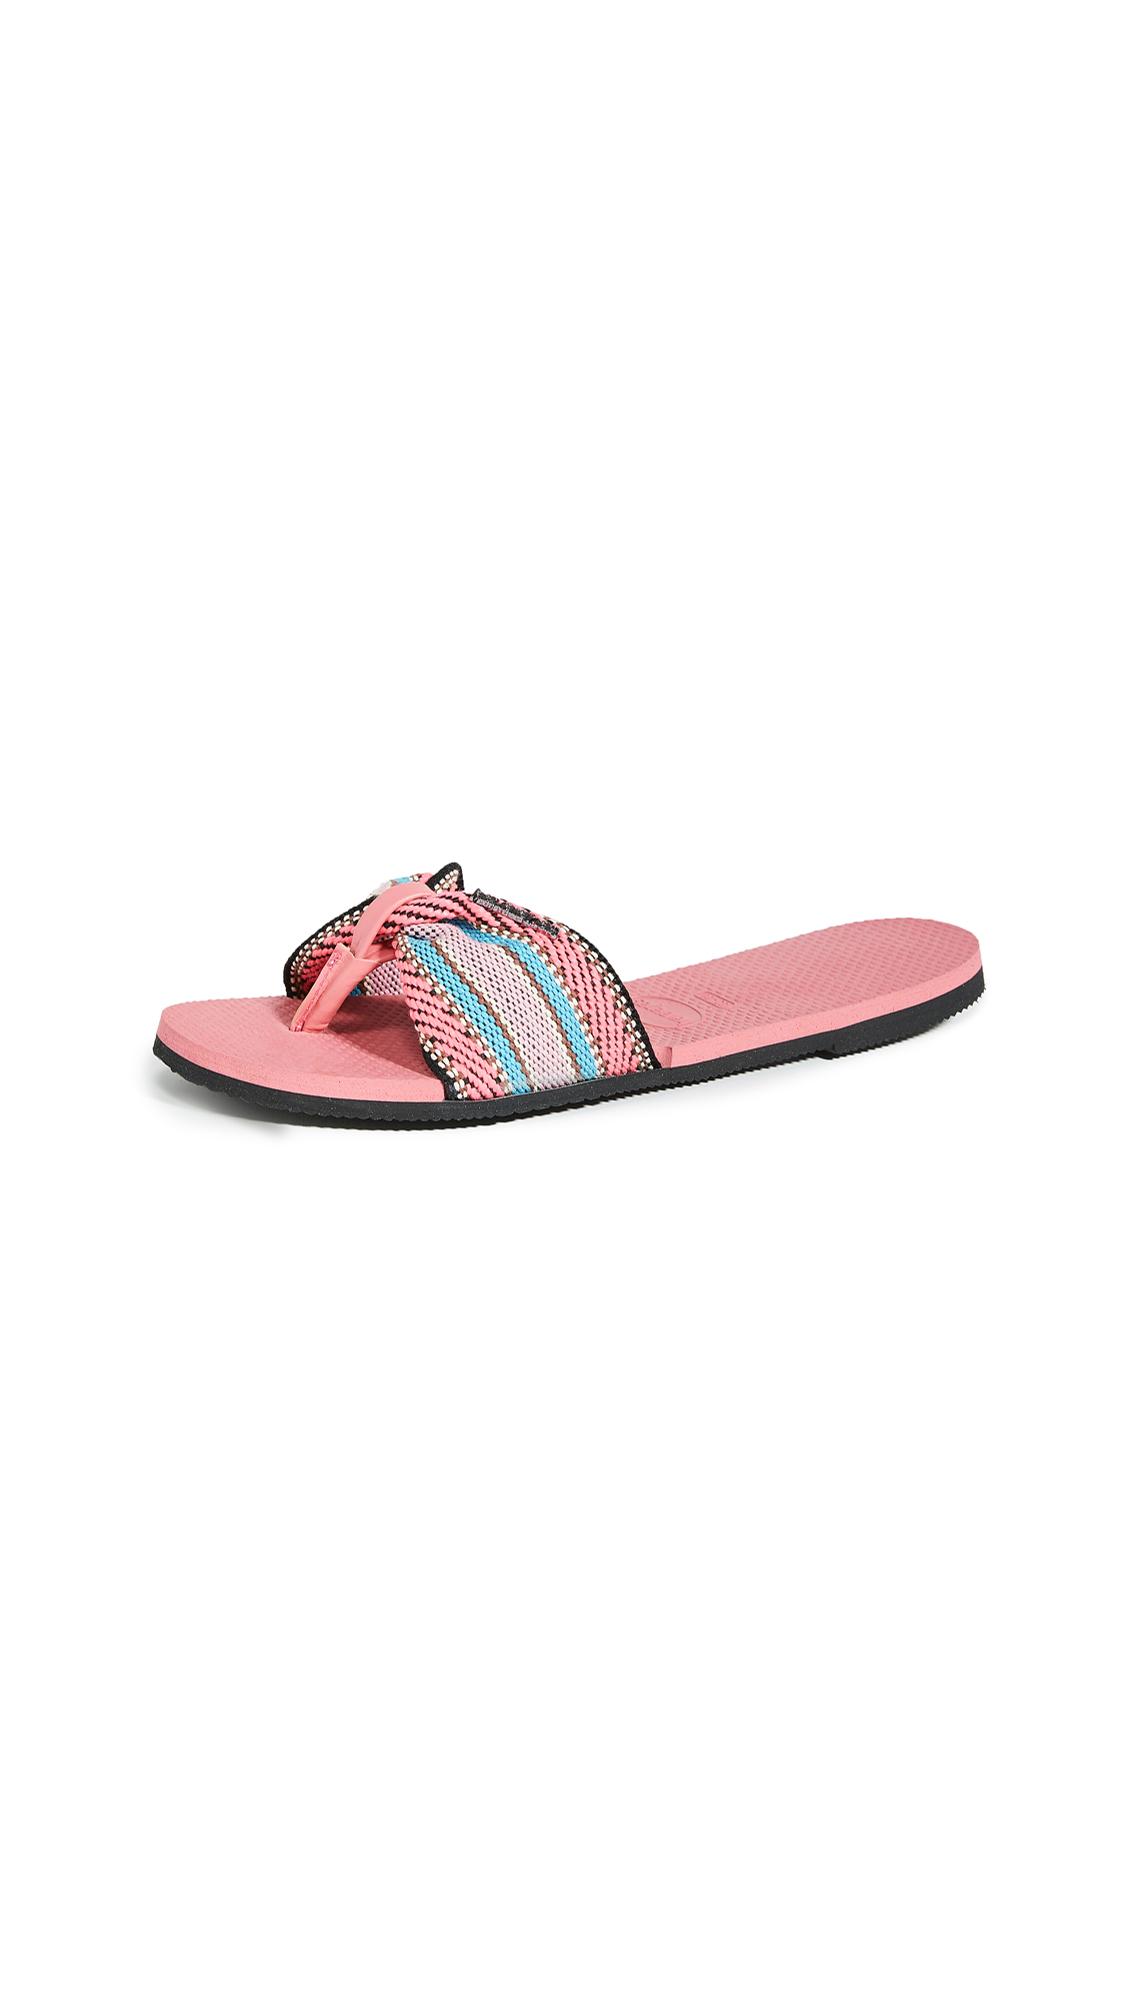 Buy Havaianas You St. Tropez Fita Flip Flops online, shop Havaianas